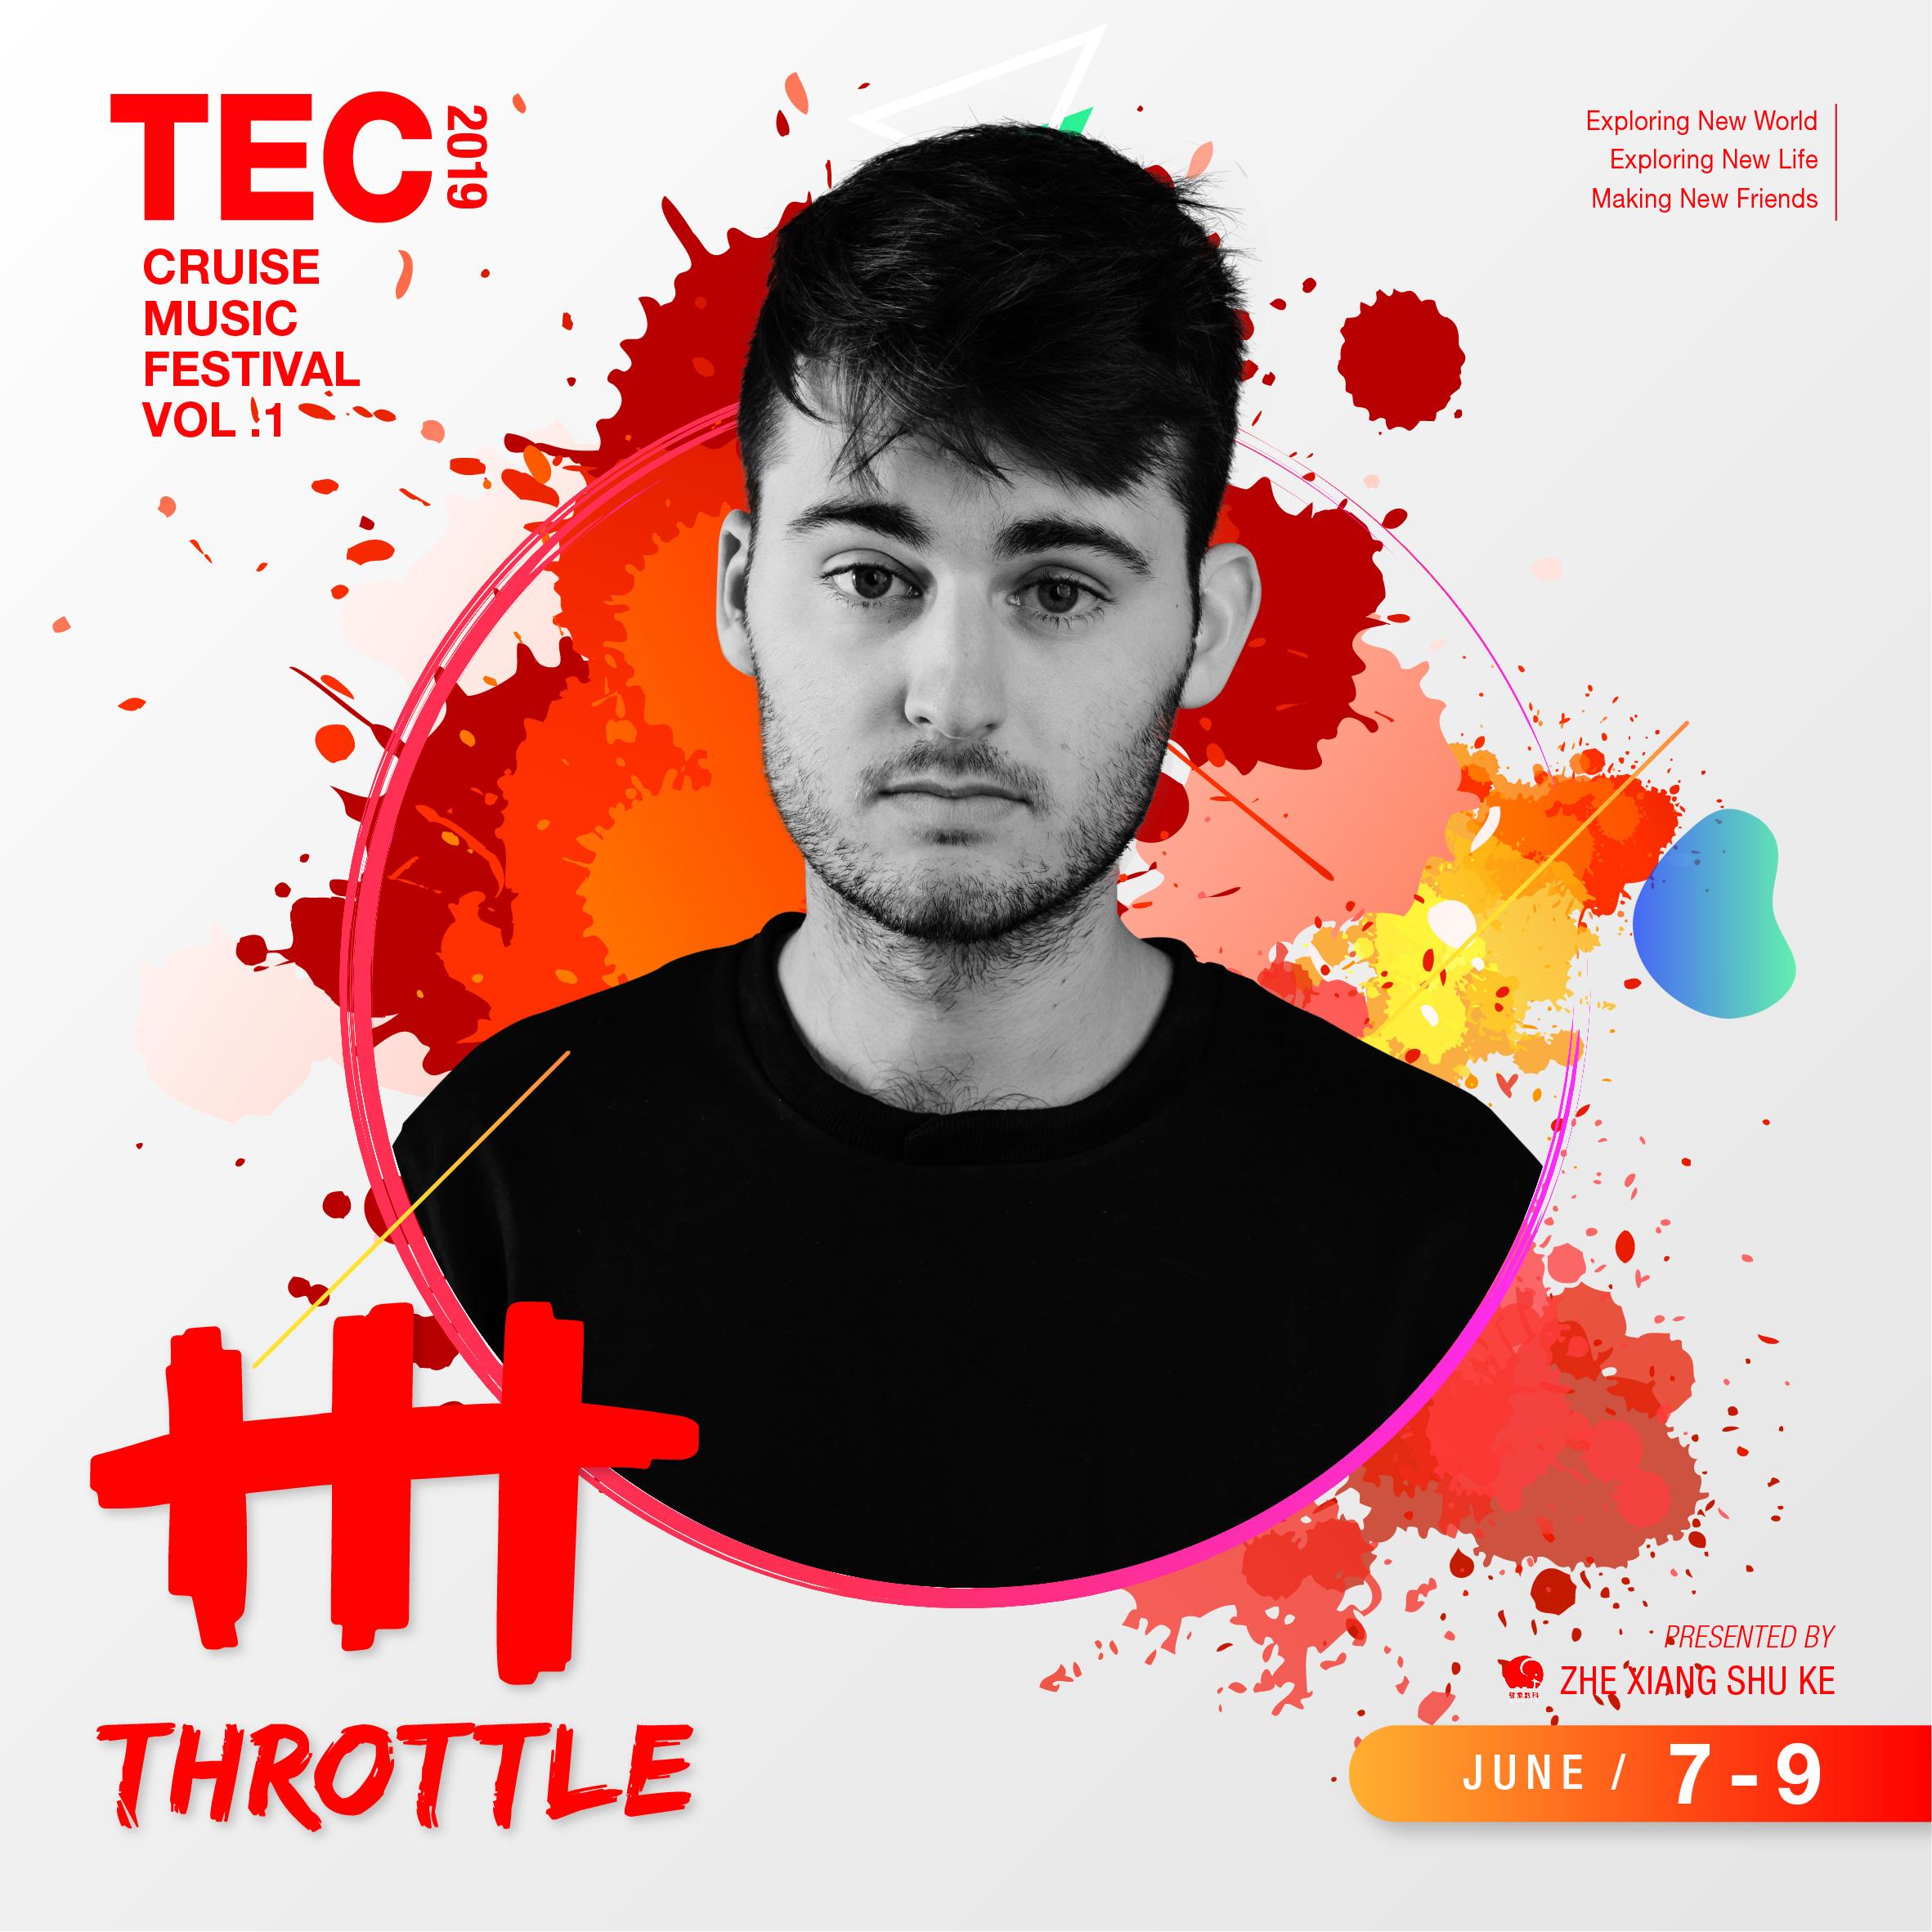 TEC Individual Artwork - Throttle.JPG